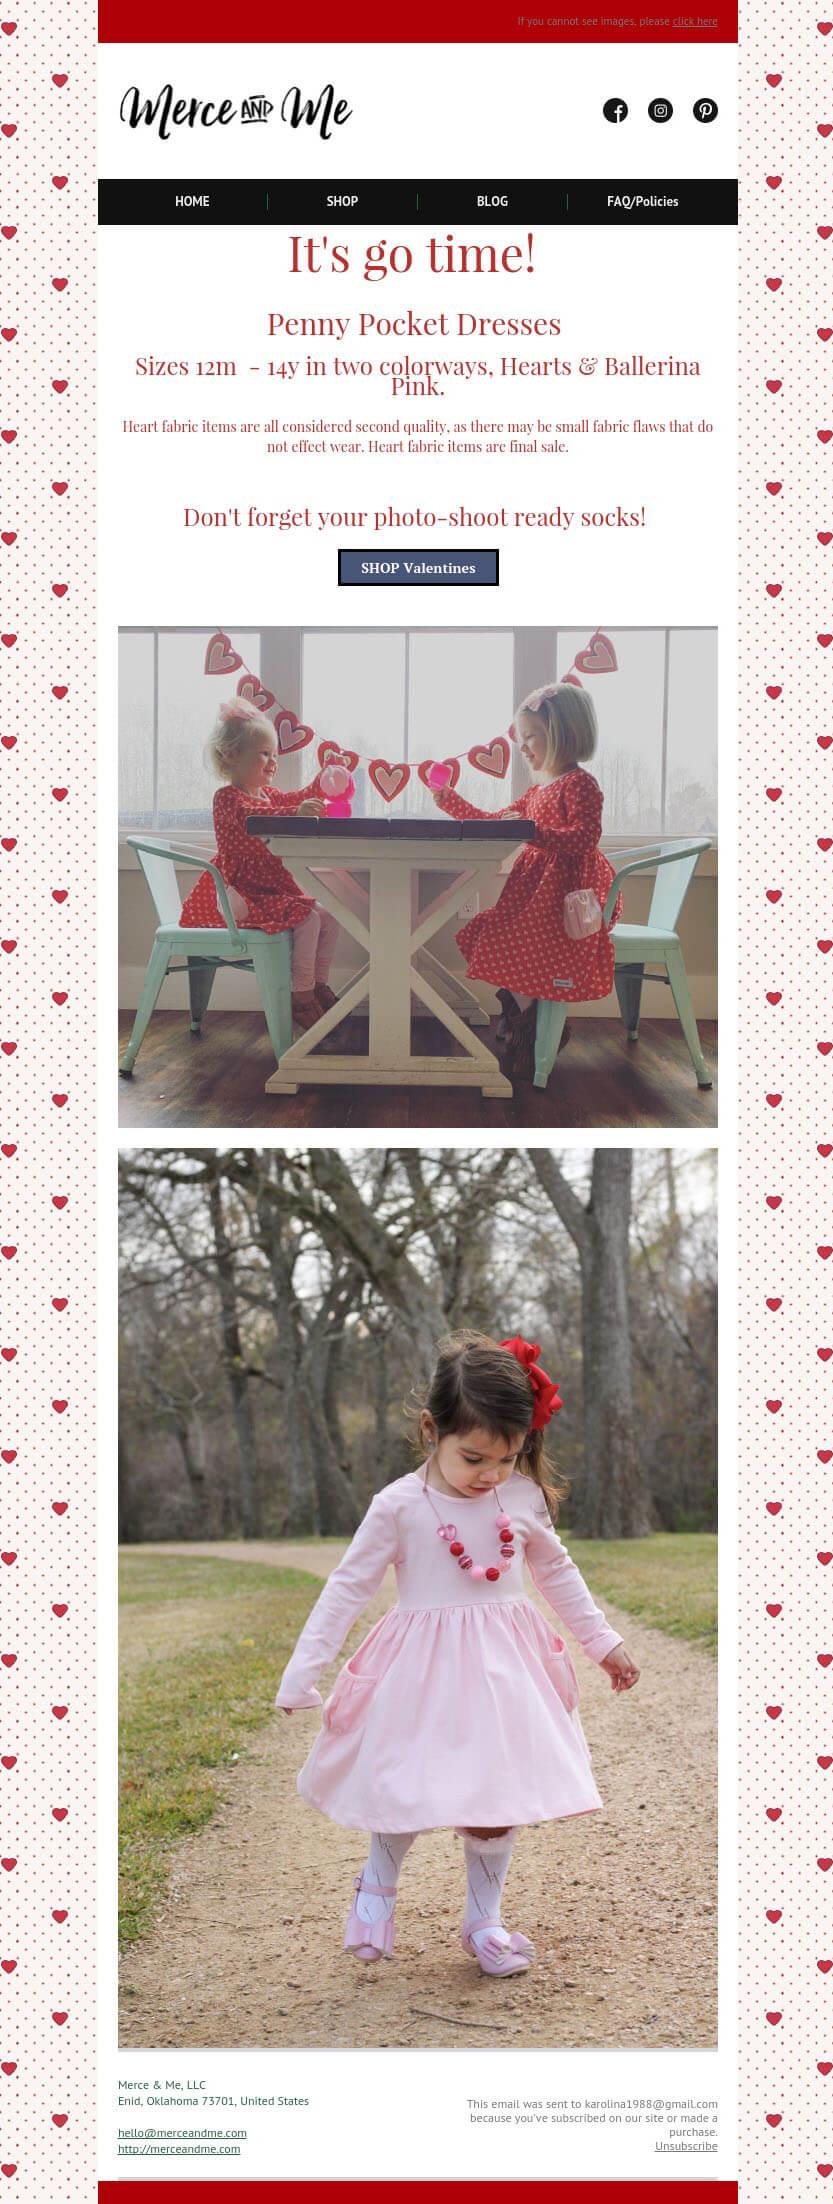 merce-and-me-valentine-newsletter